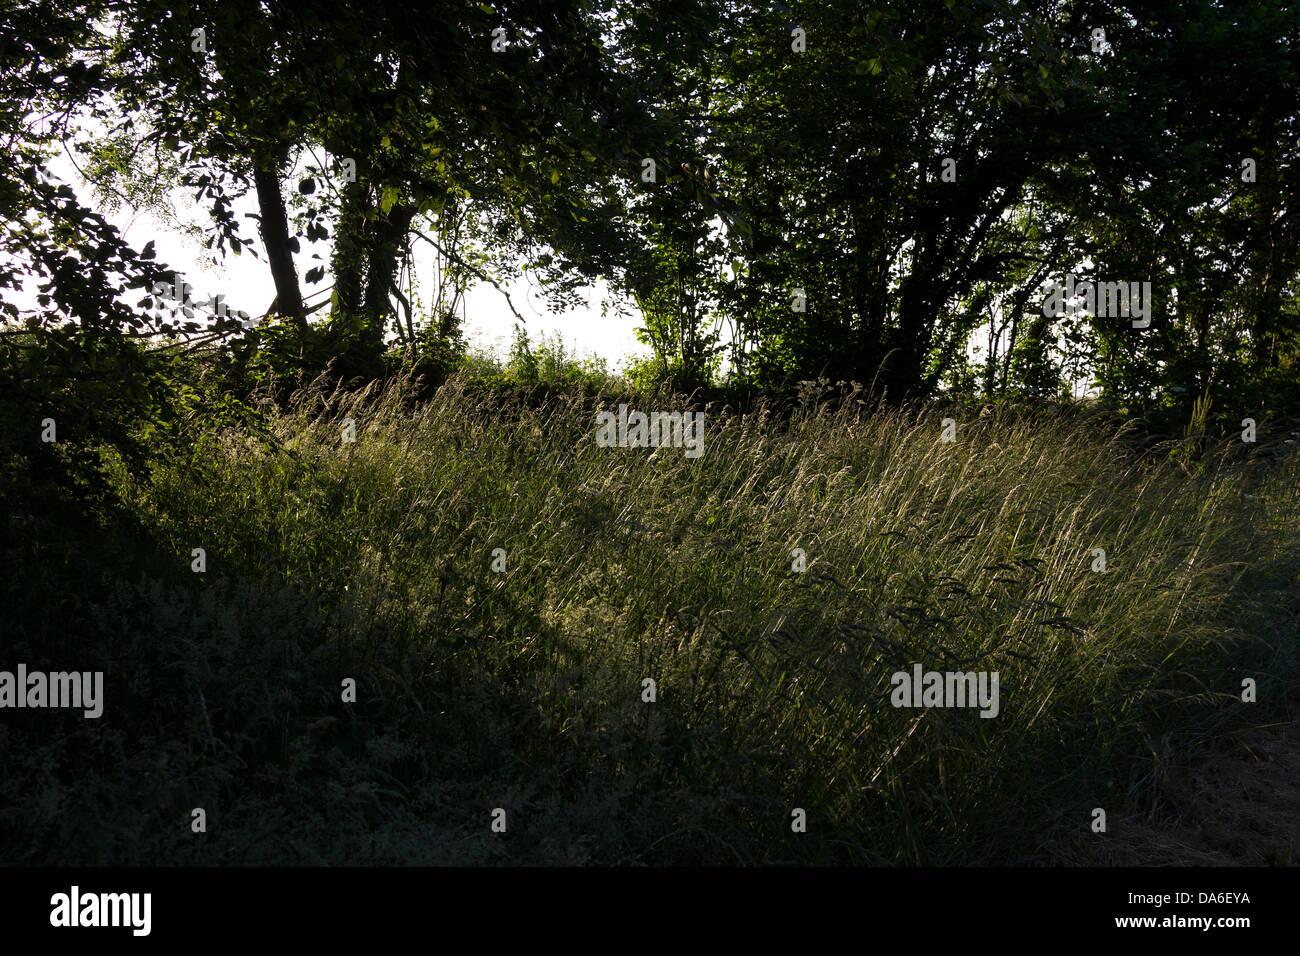 Farming in Devon,defra,the environment, rural development, the countryside, wildlife, animal welfare barn, farm, - Stock Image